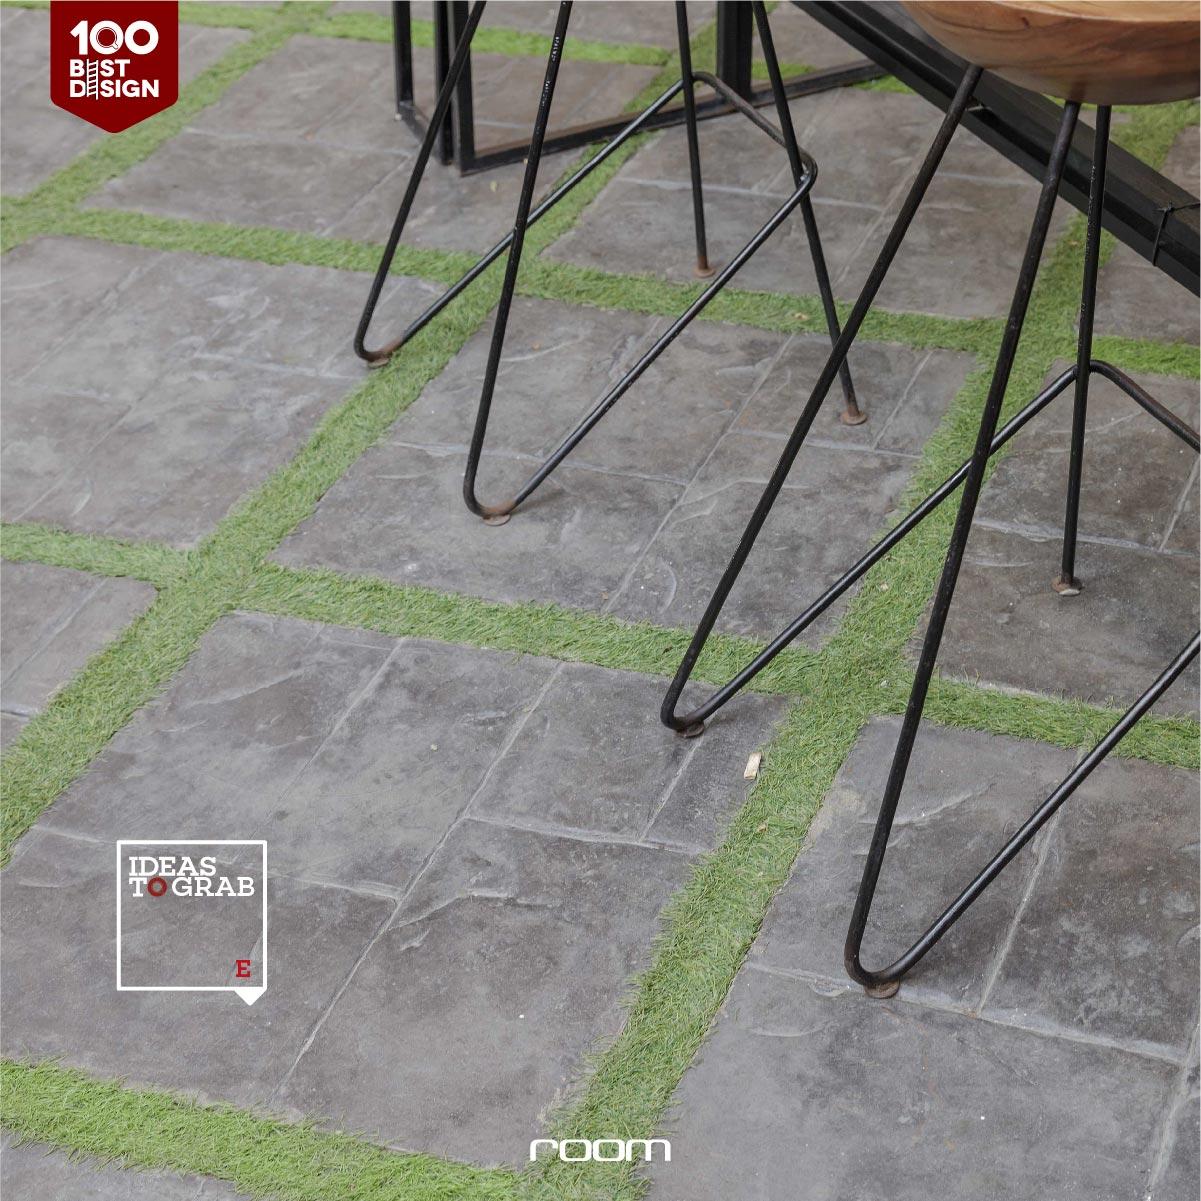 Floor for restaurant idea